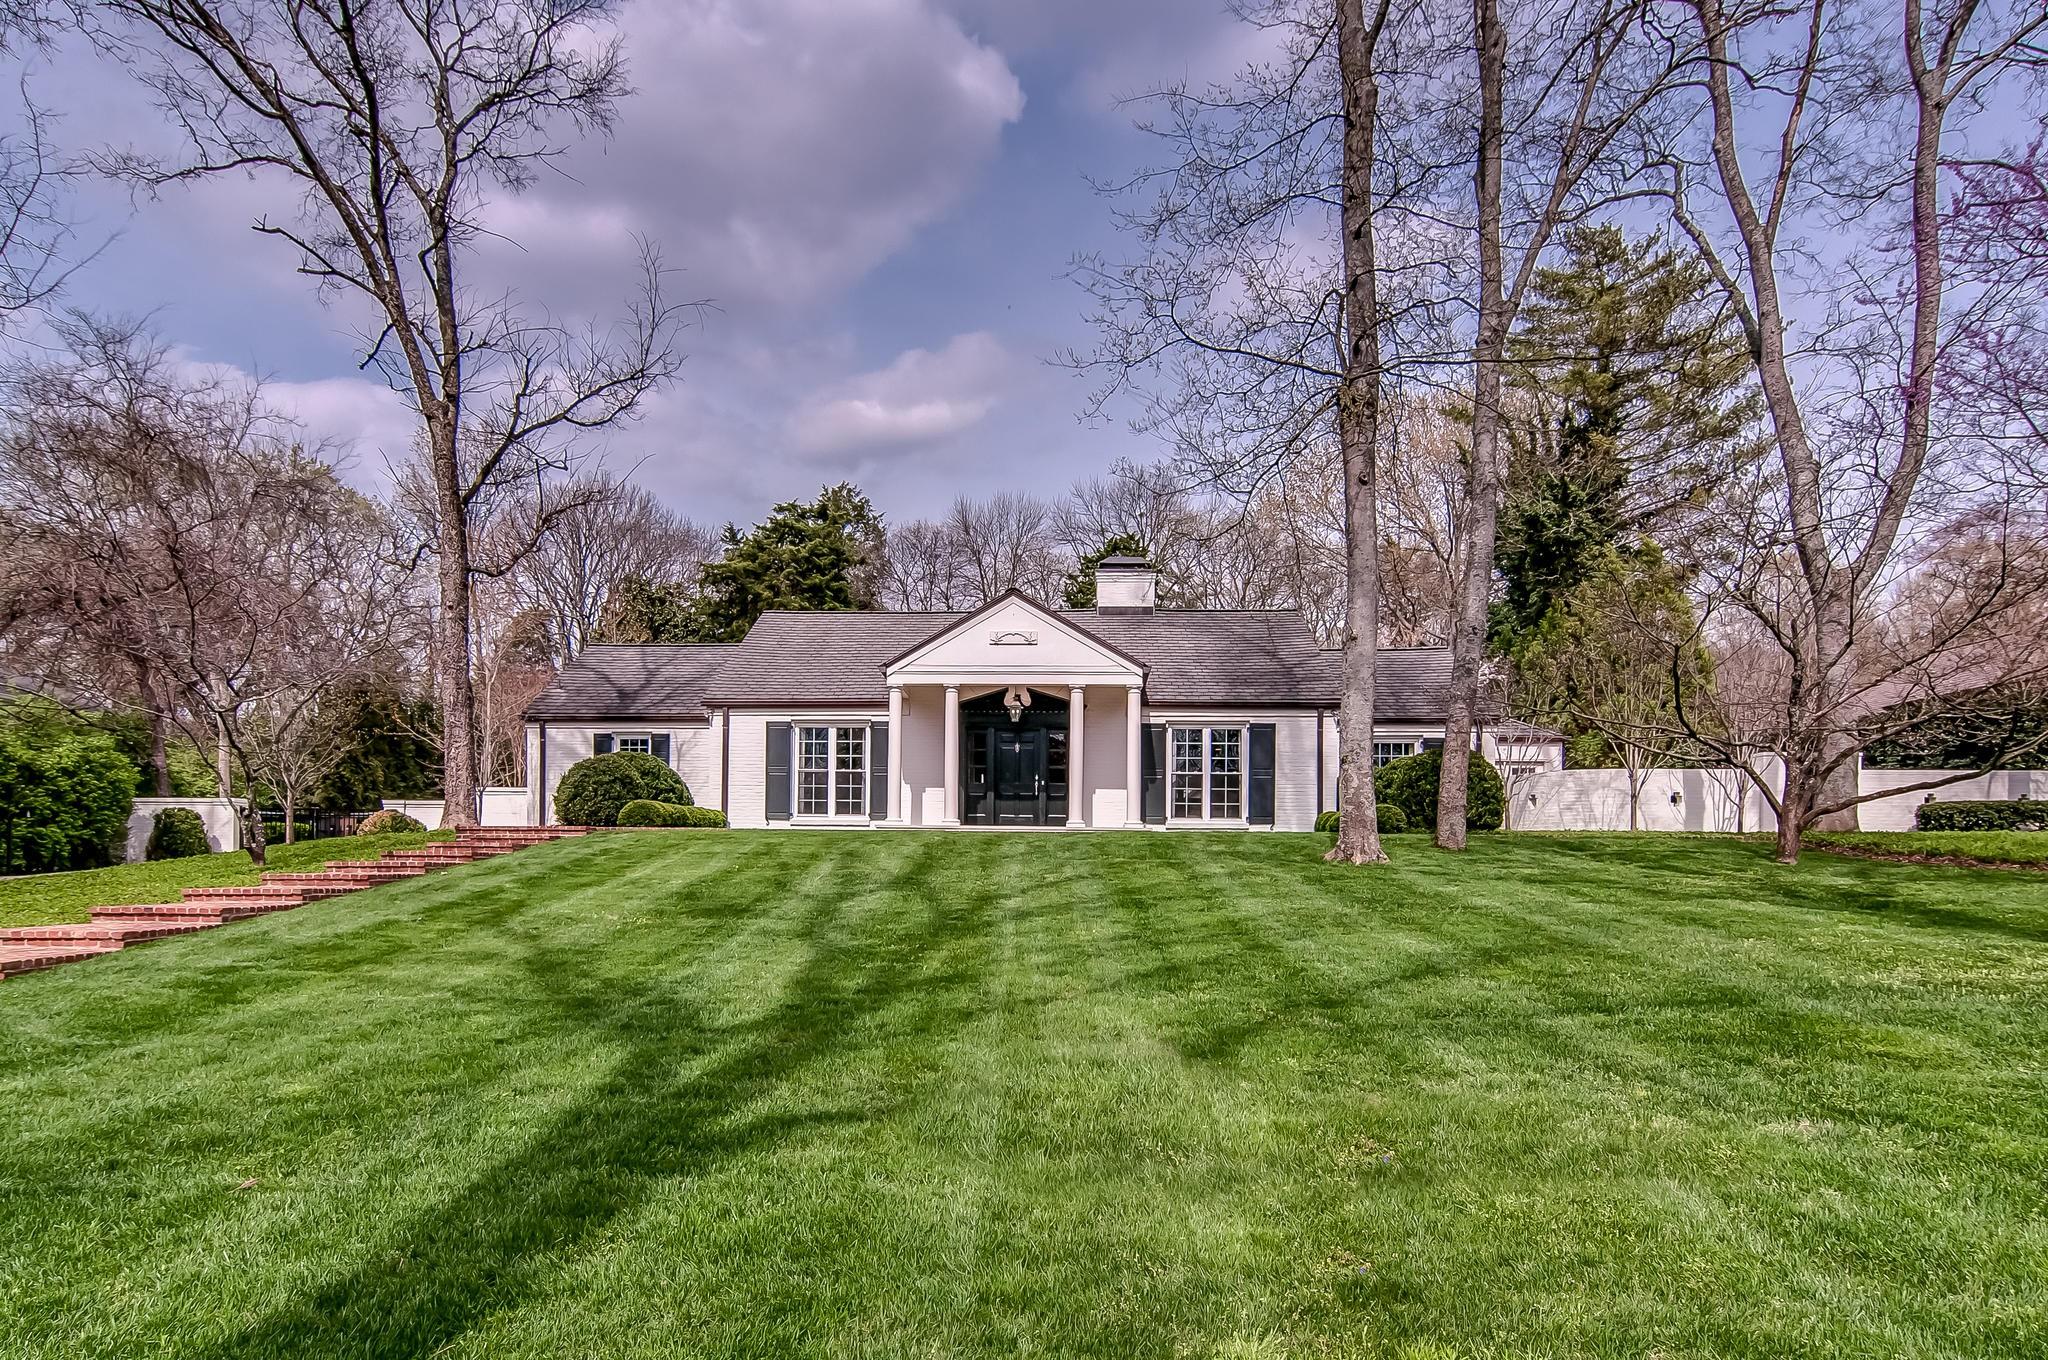 2904 Tyne Blvd, Nashville, TN 37215 - Nashville, TN real estate listing